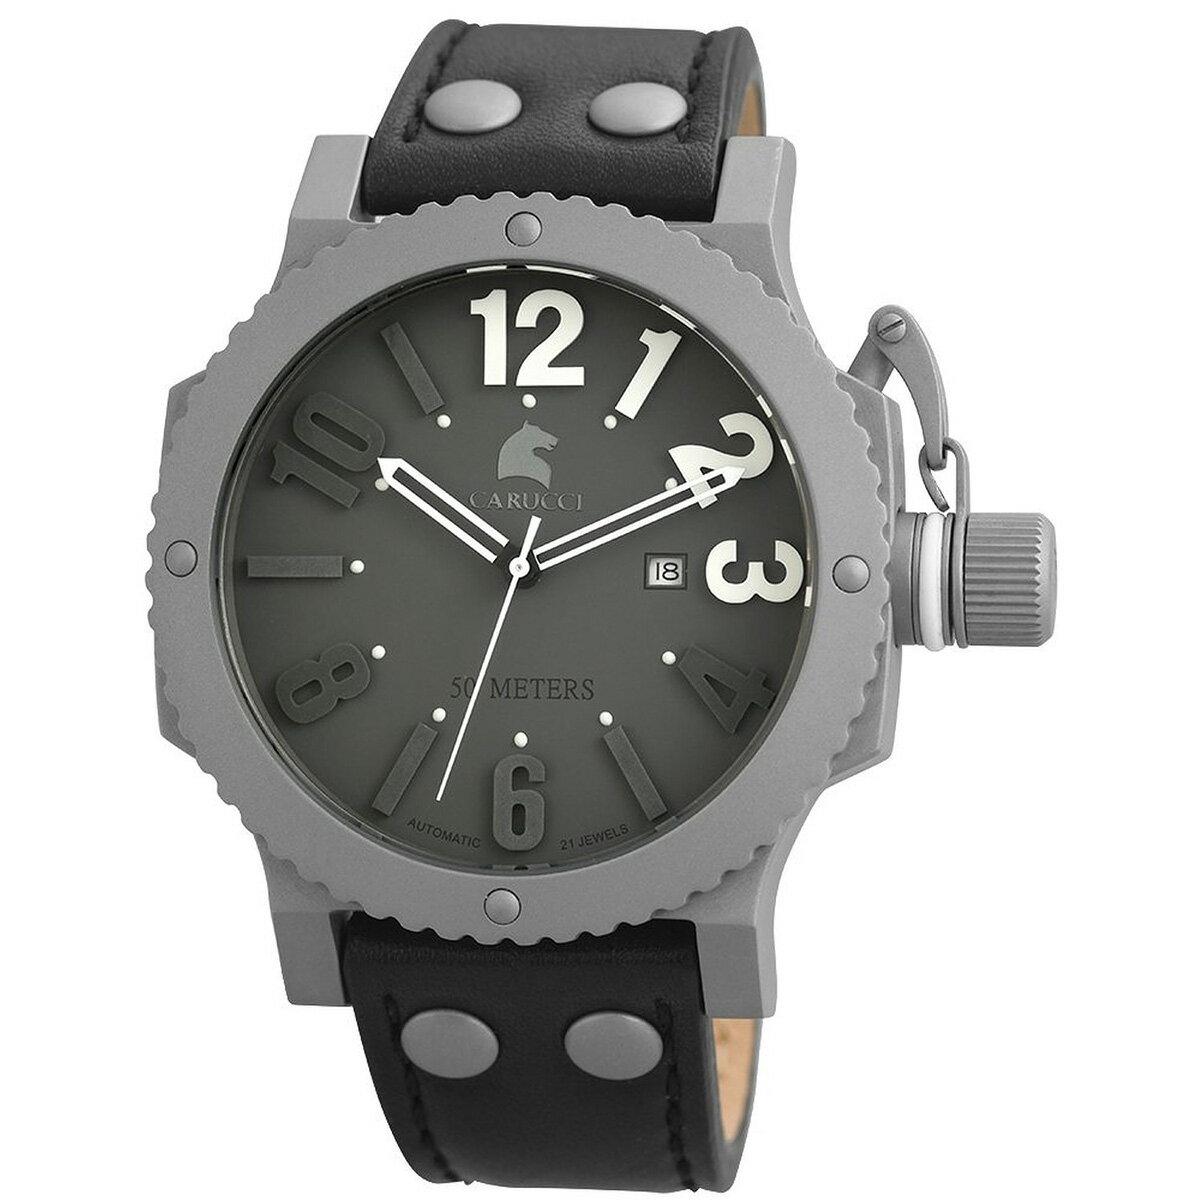 Carucci カルッチ 自動巻き 腕時計 メンズ [CA2211GR-BK] 並行輸入品 メーカー国際保証24ヵ月 純正ケース付き メンズウォッチ海外 個性派 腕時計【腕時計 置き おしゃれ】